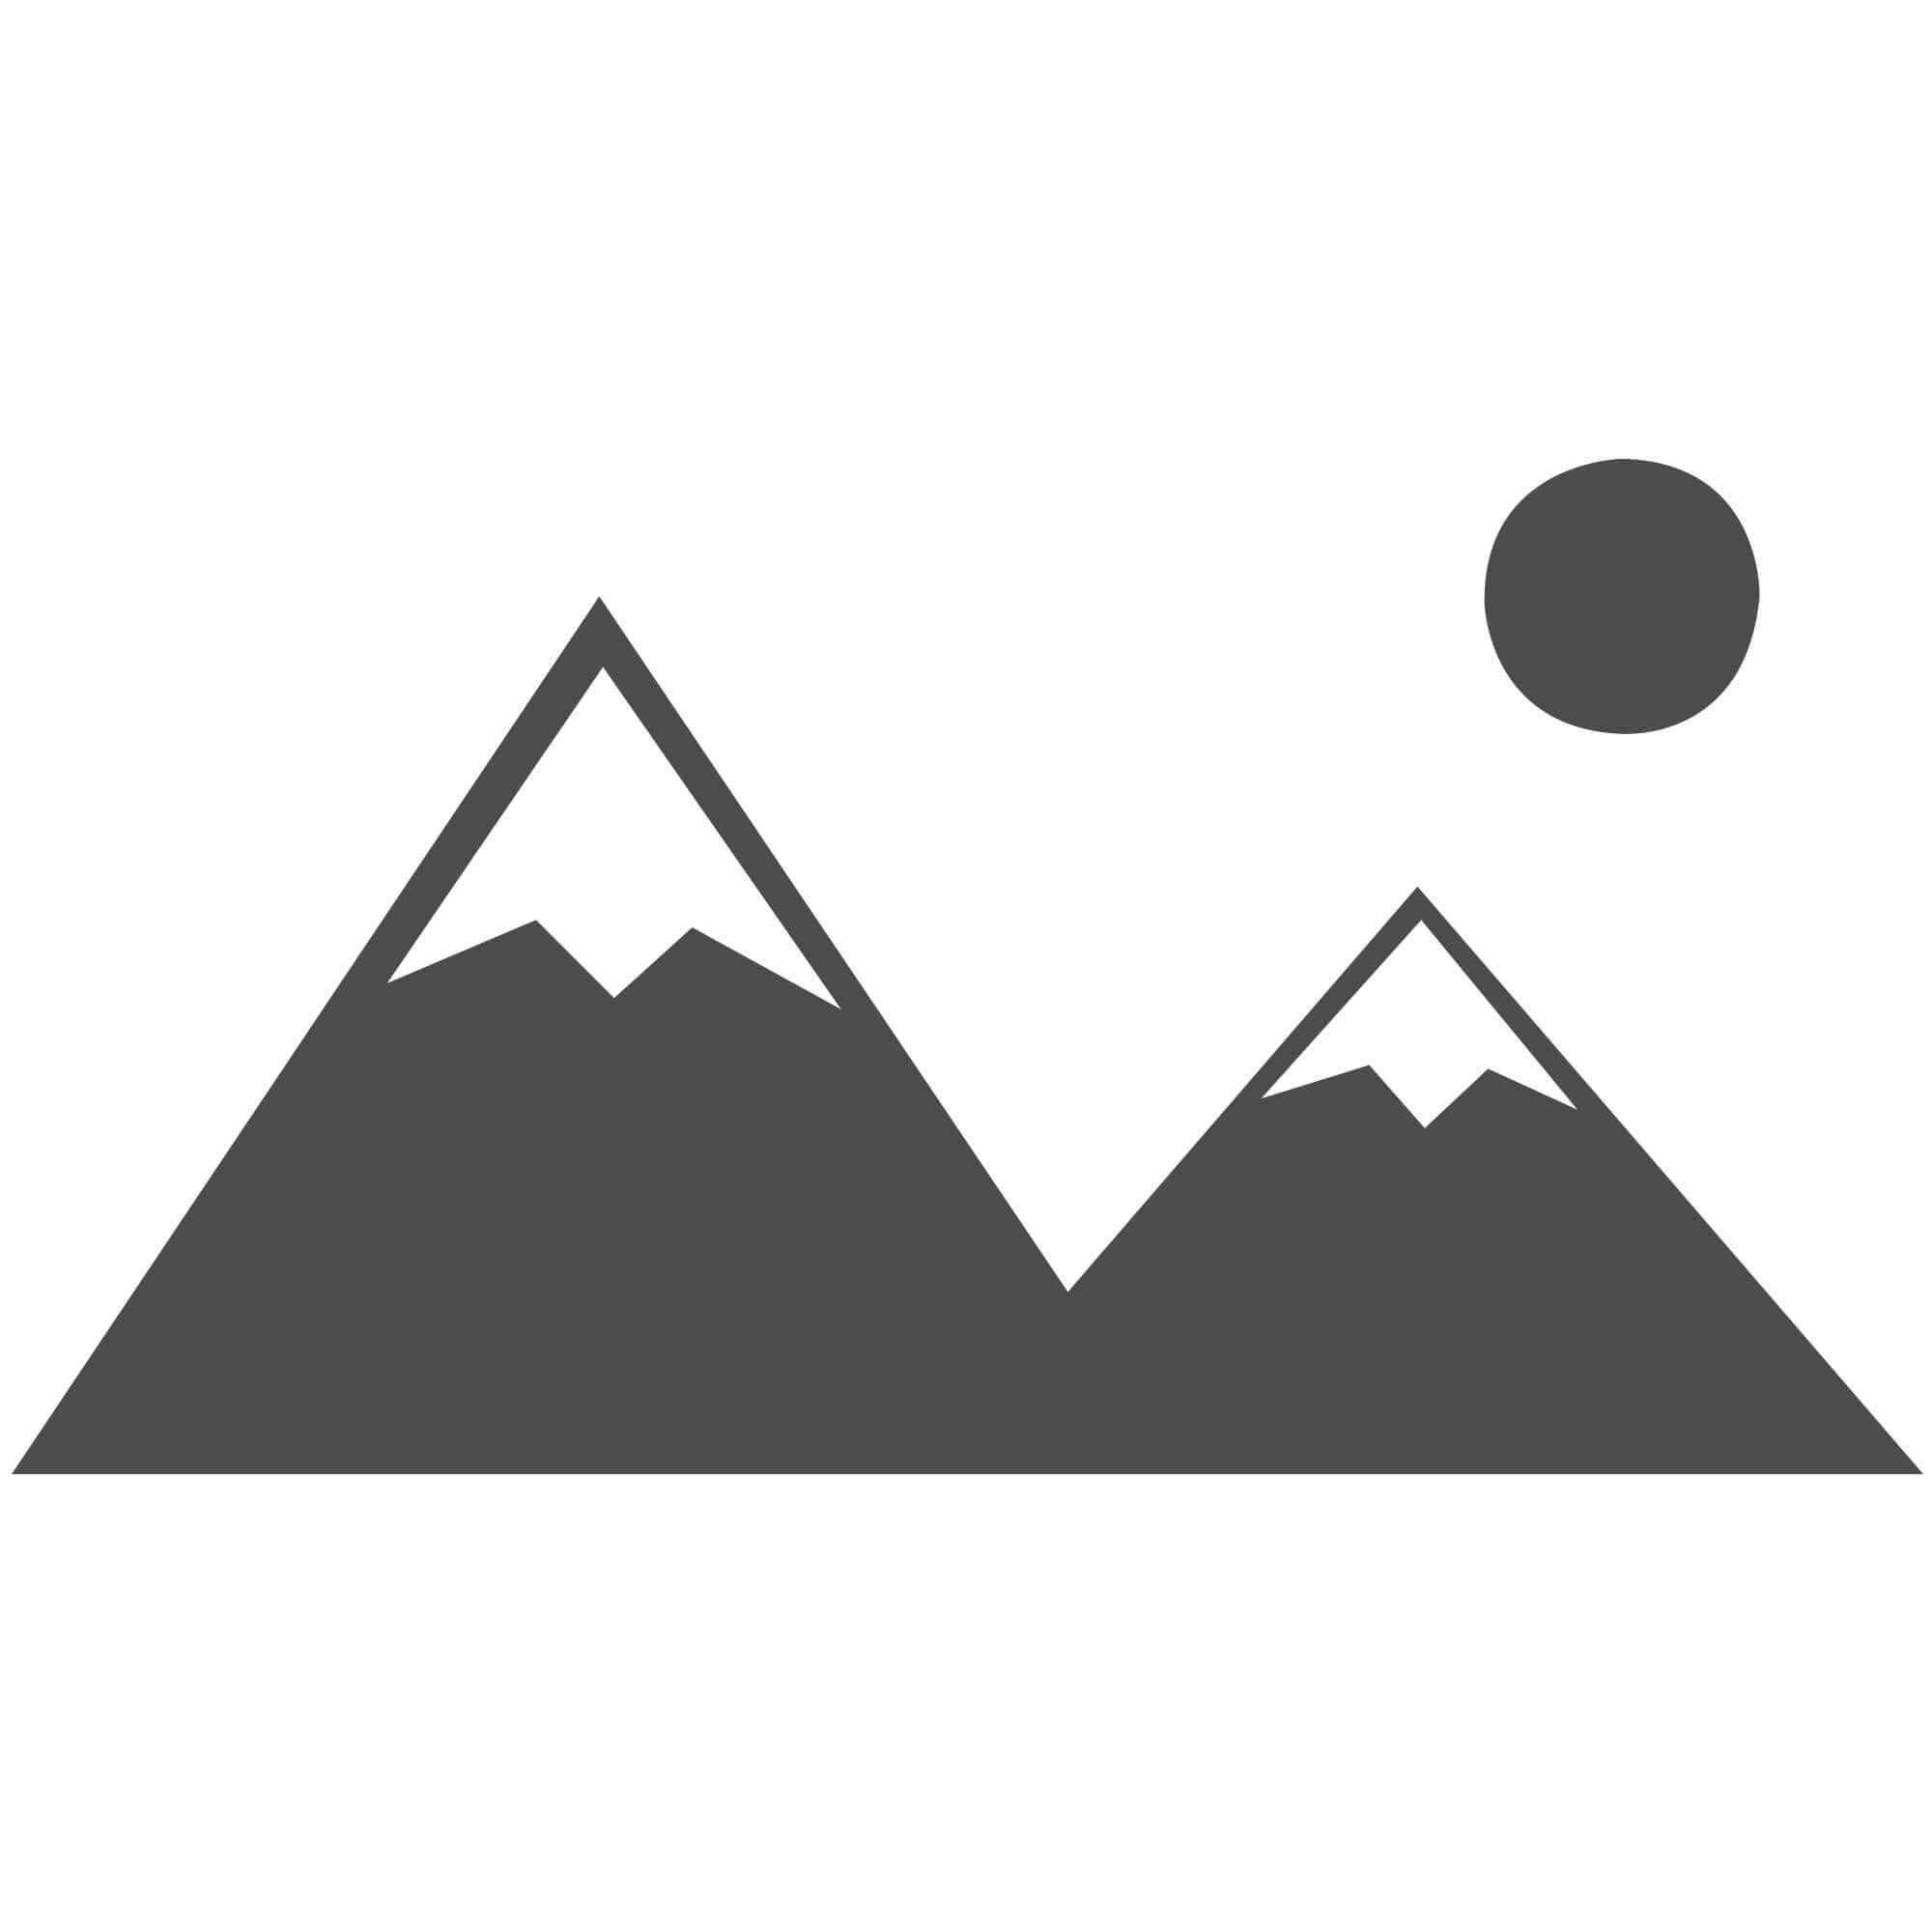 "Galleria Rug - Stripe Multi 79164 4848 - Size 200 x 290 cm (6'7"" x 9'6"")"